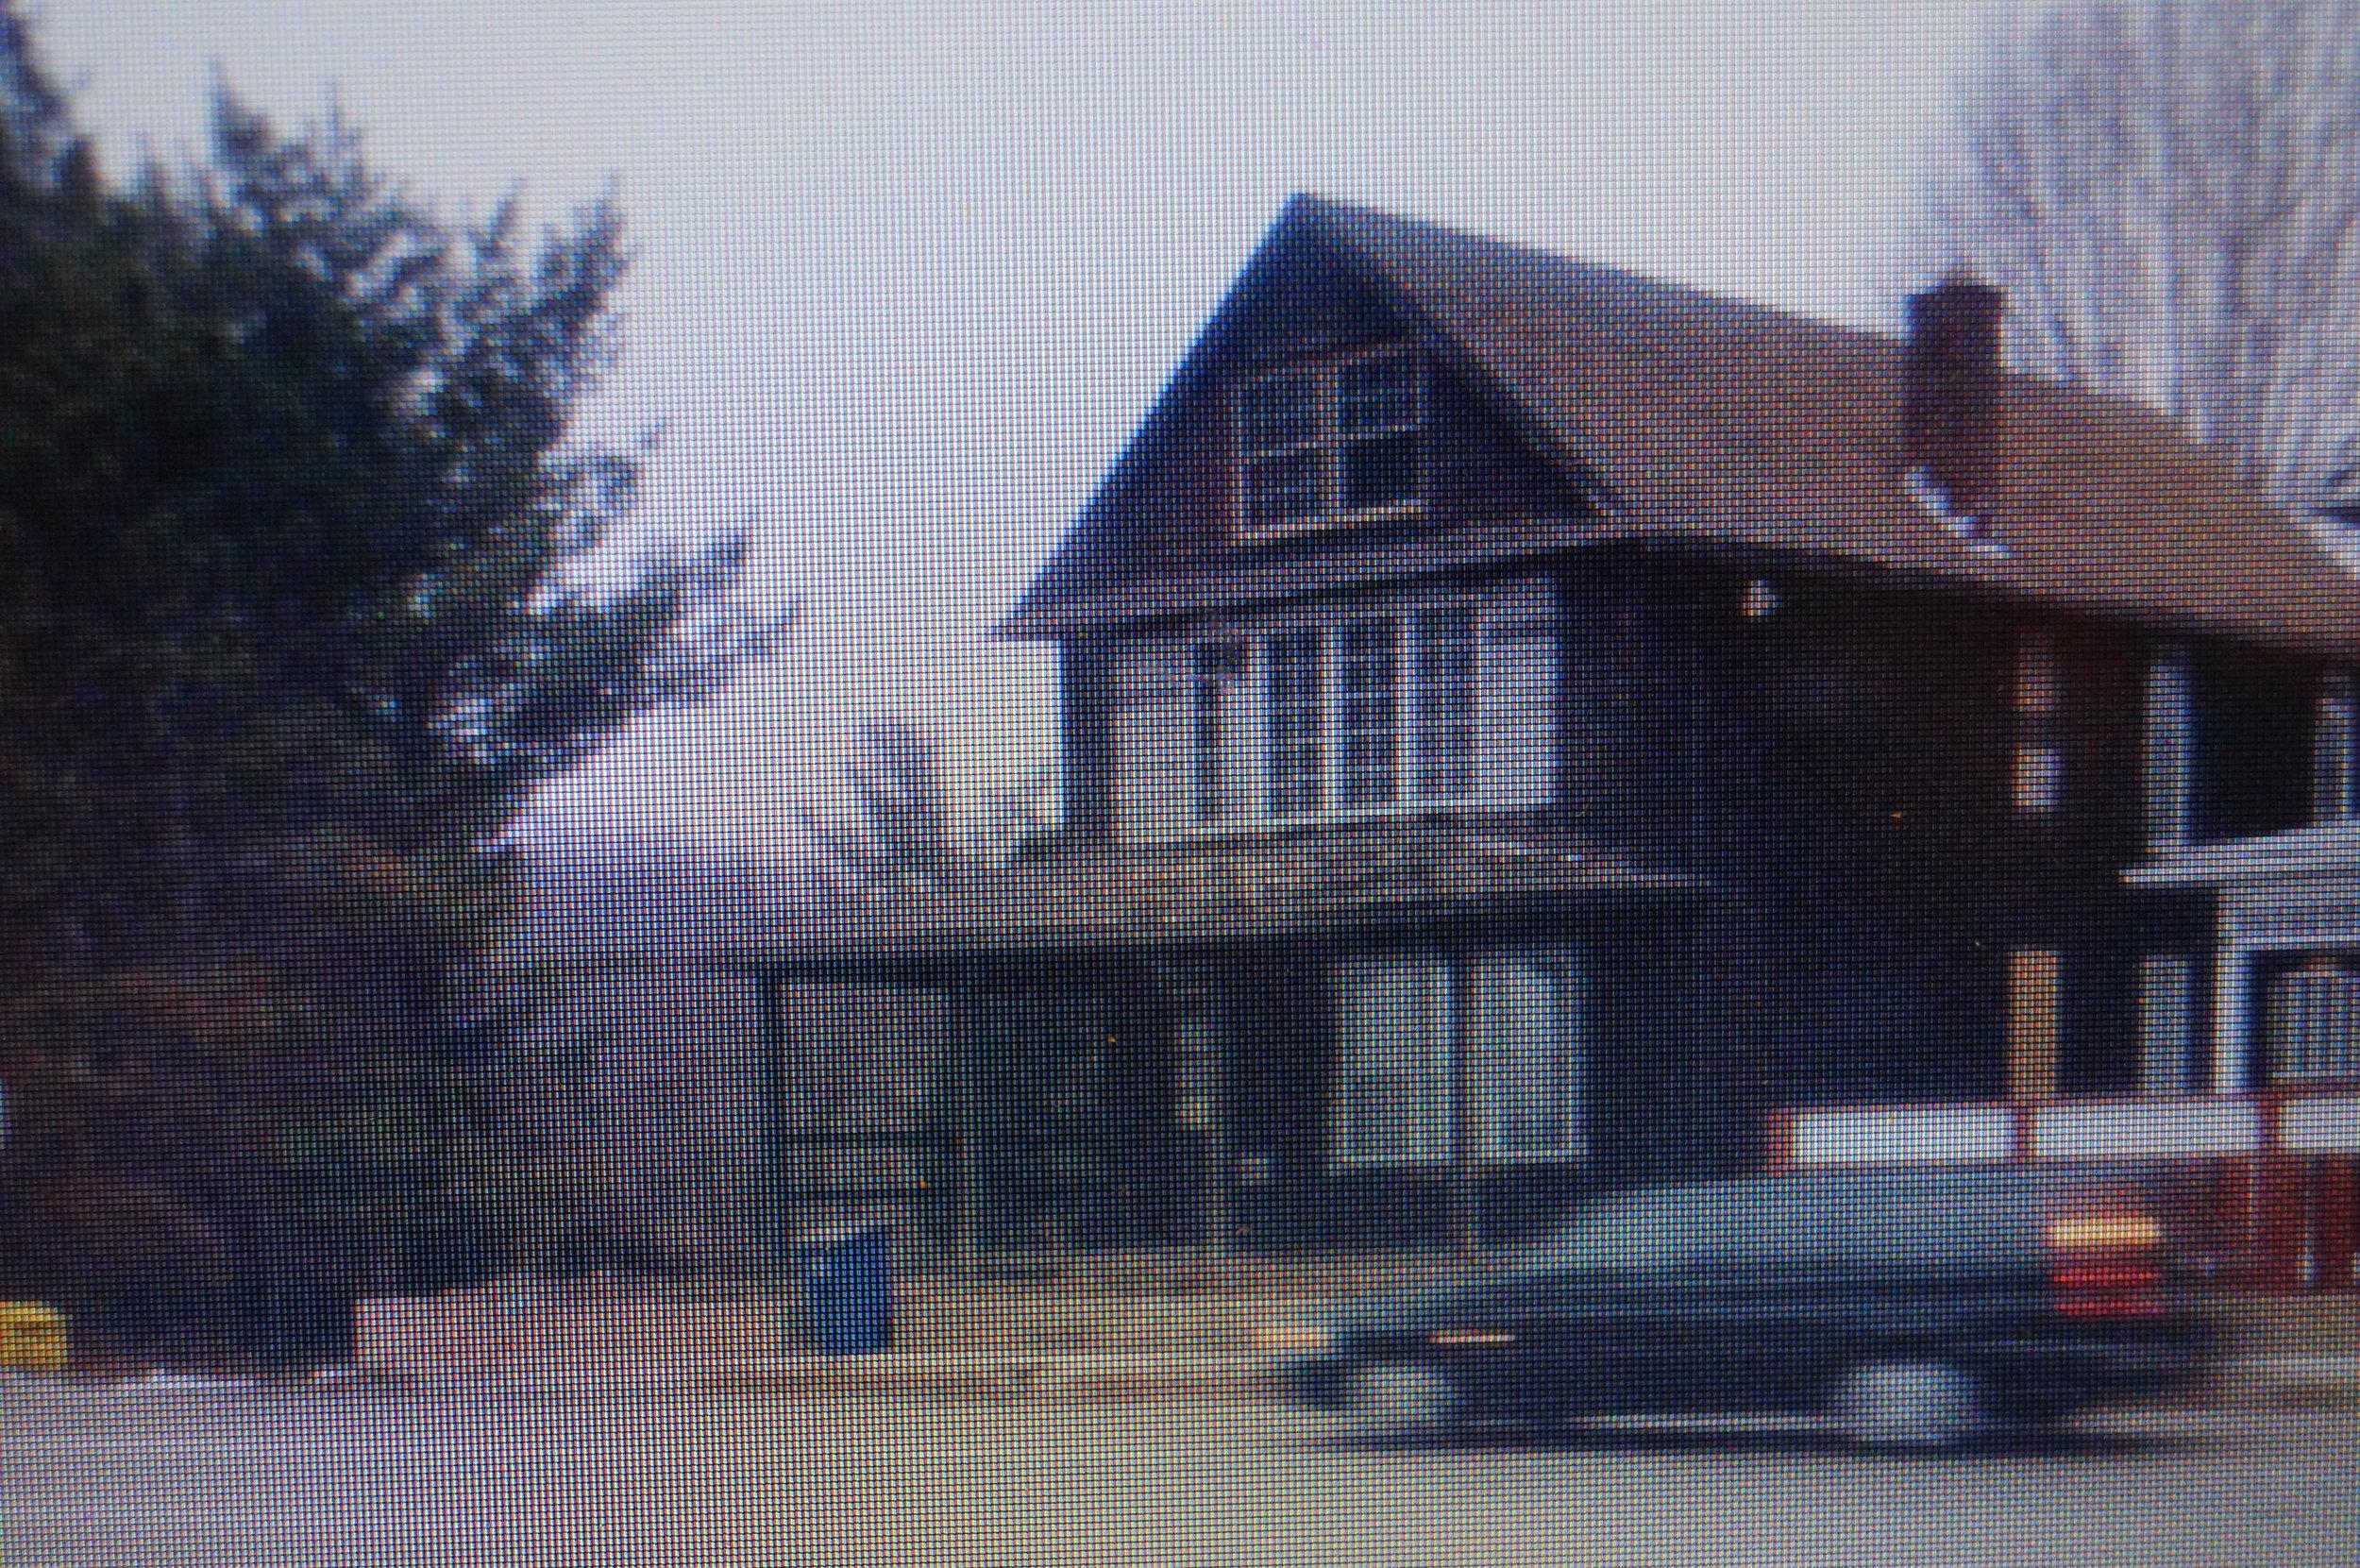 brownhouse2.jpg